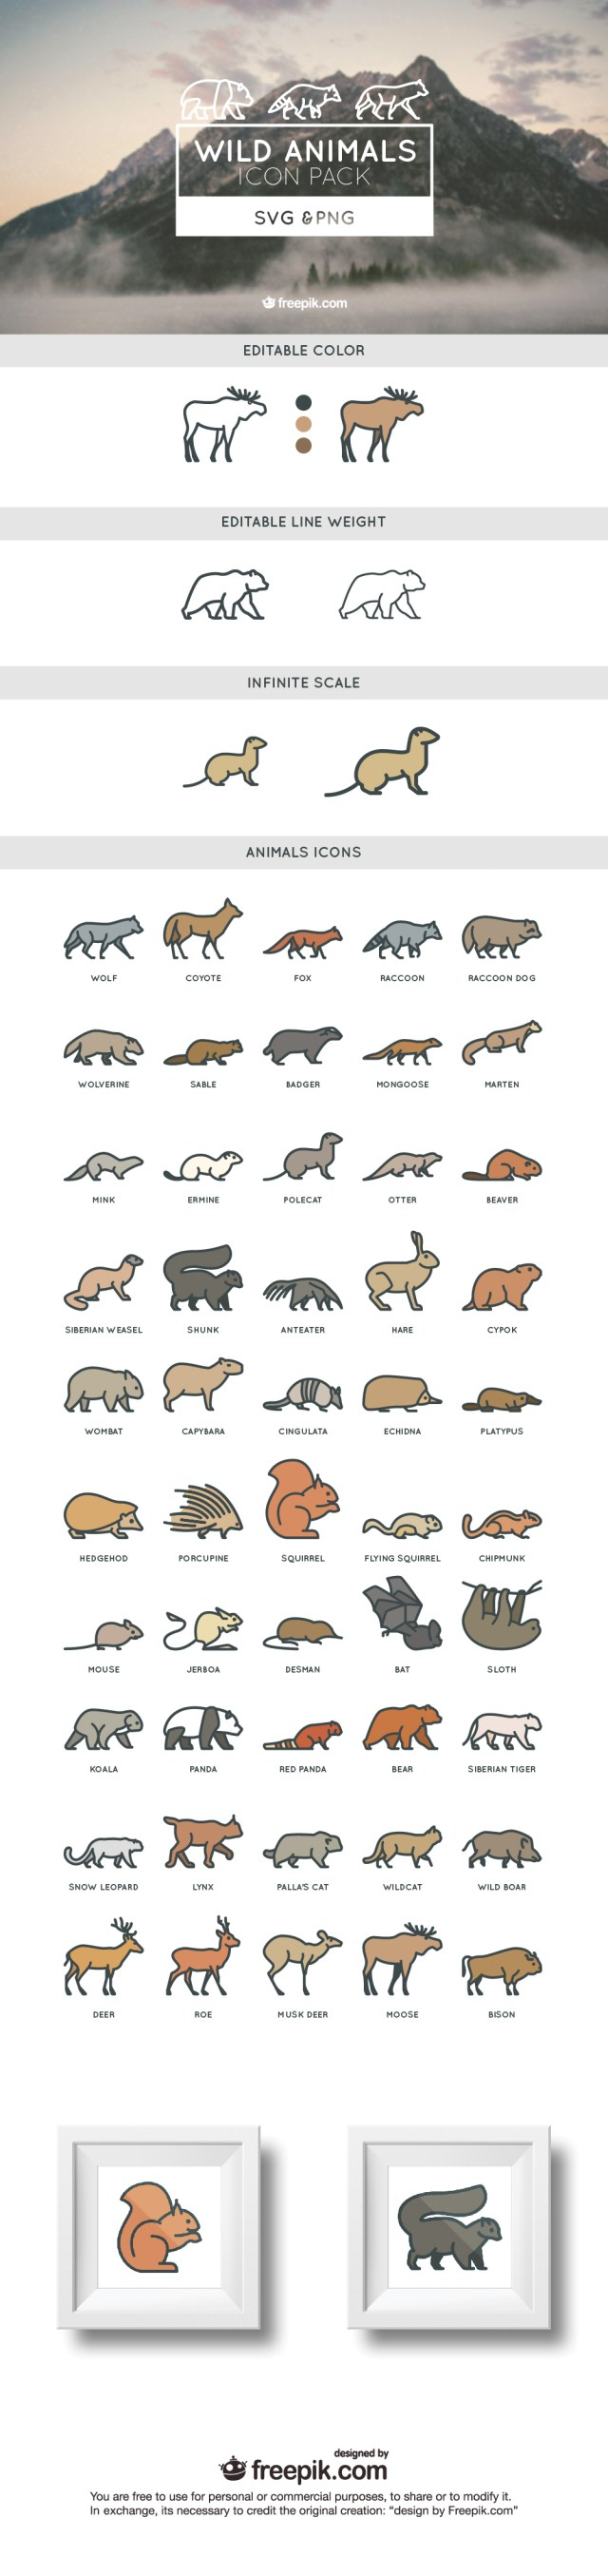 ANIMALS_COVER-01-01